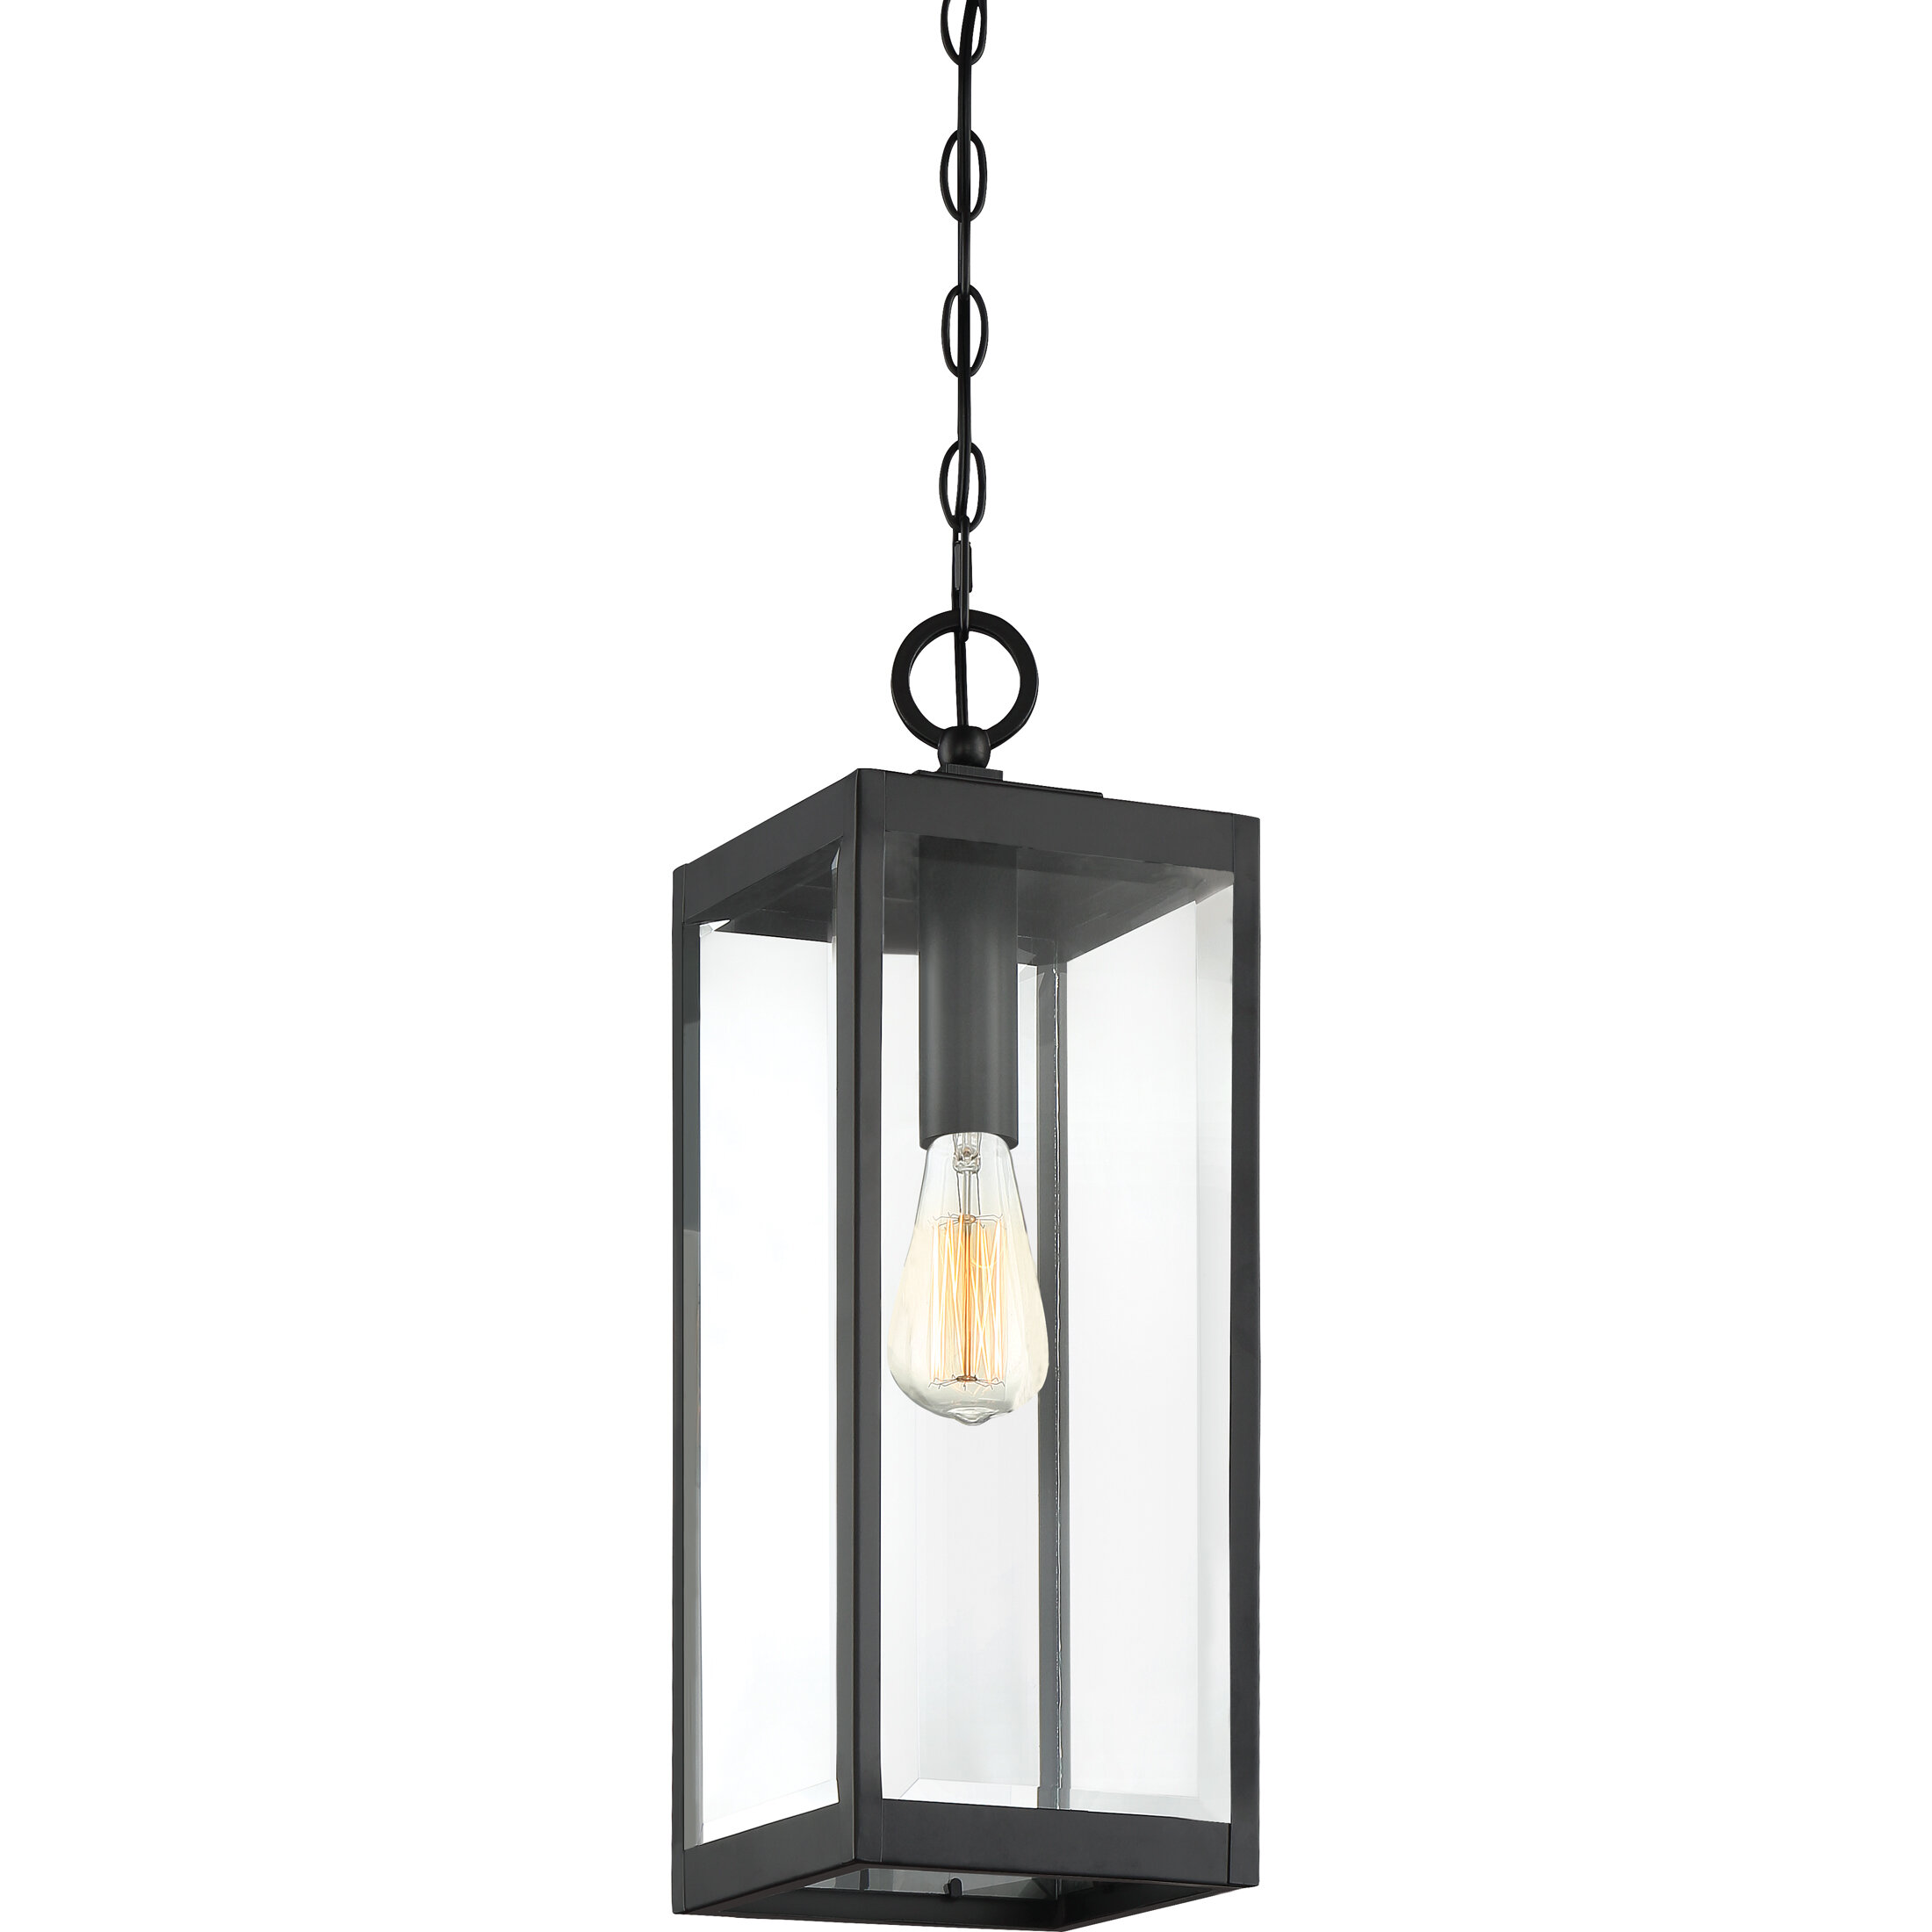 Bulb 20 75 H Outdoor Hanging Lantern